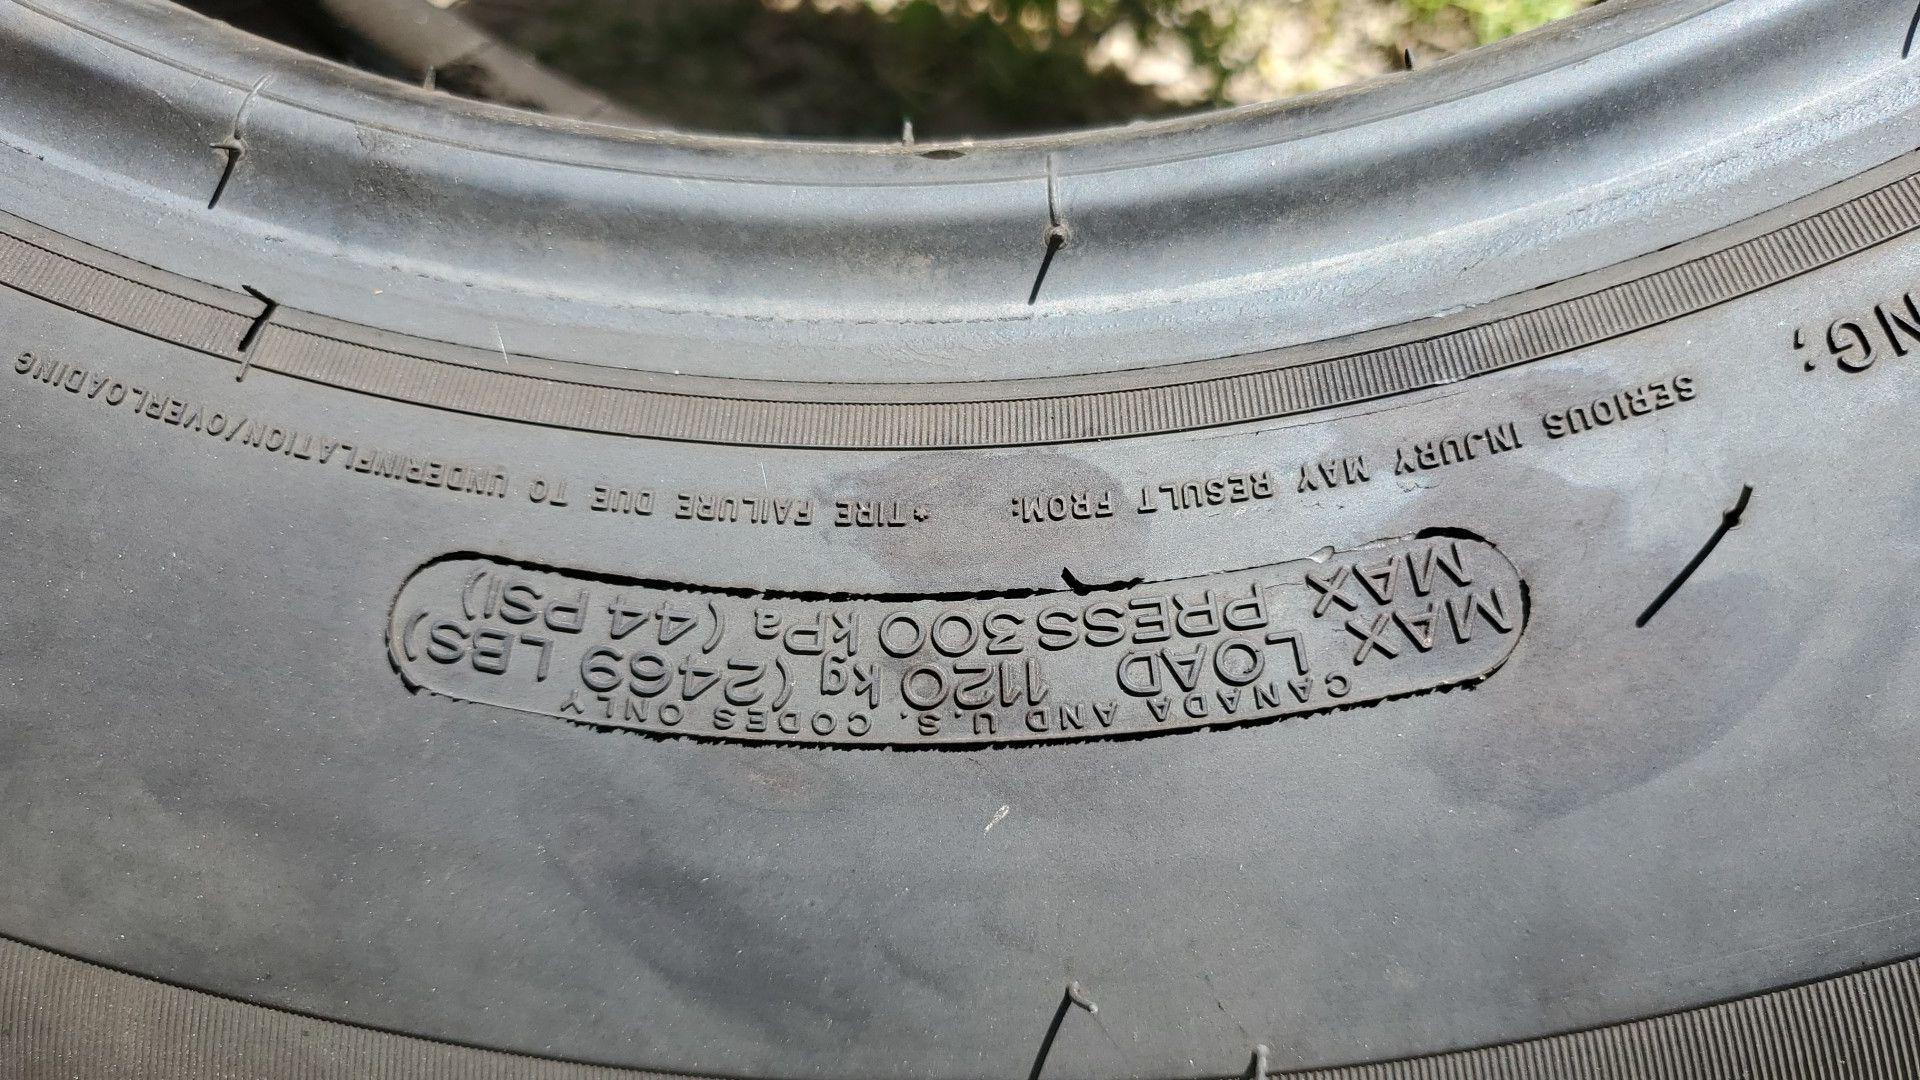 MICHELIN 245/75R17 Tires